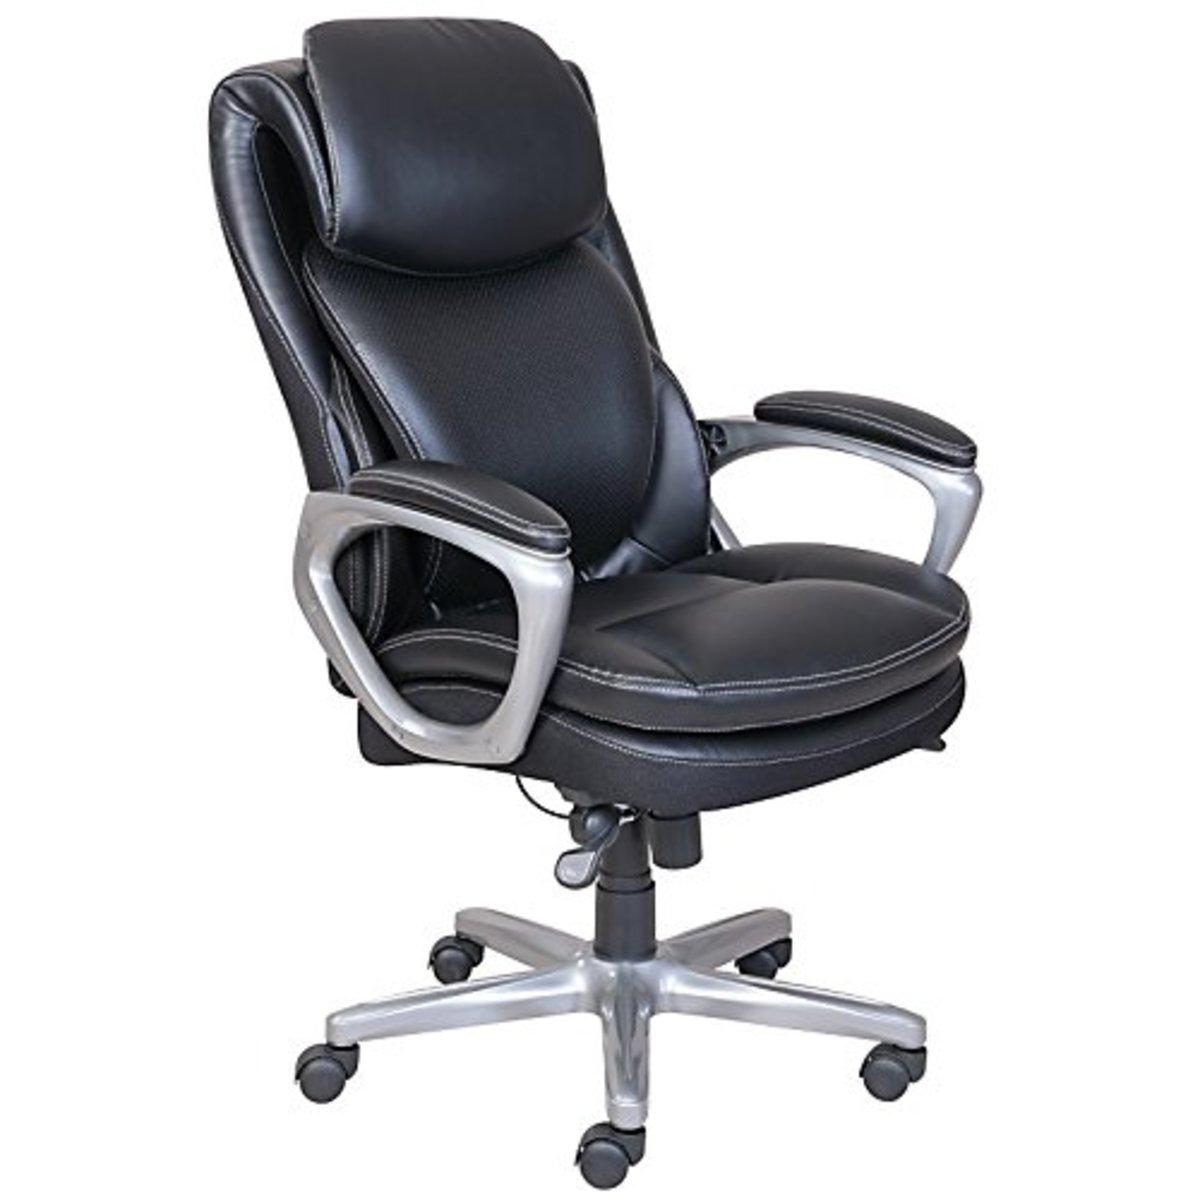 Serta Smart Layers AIR Arlington Executive Chair